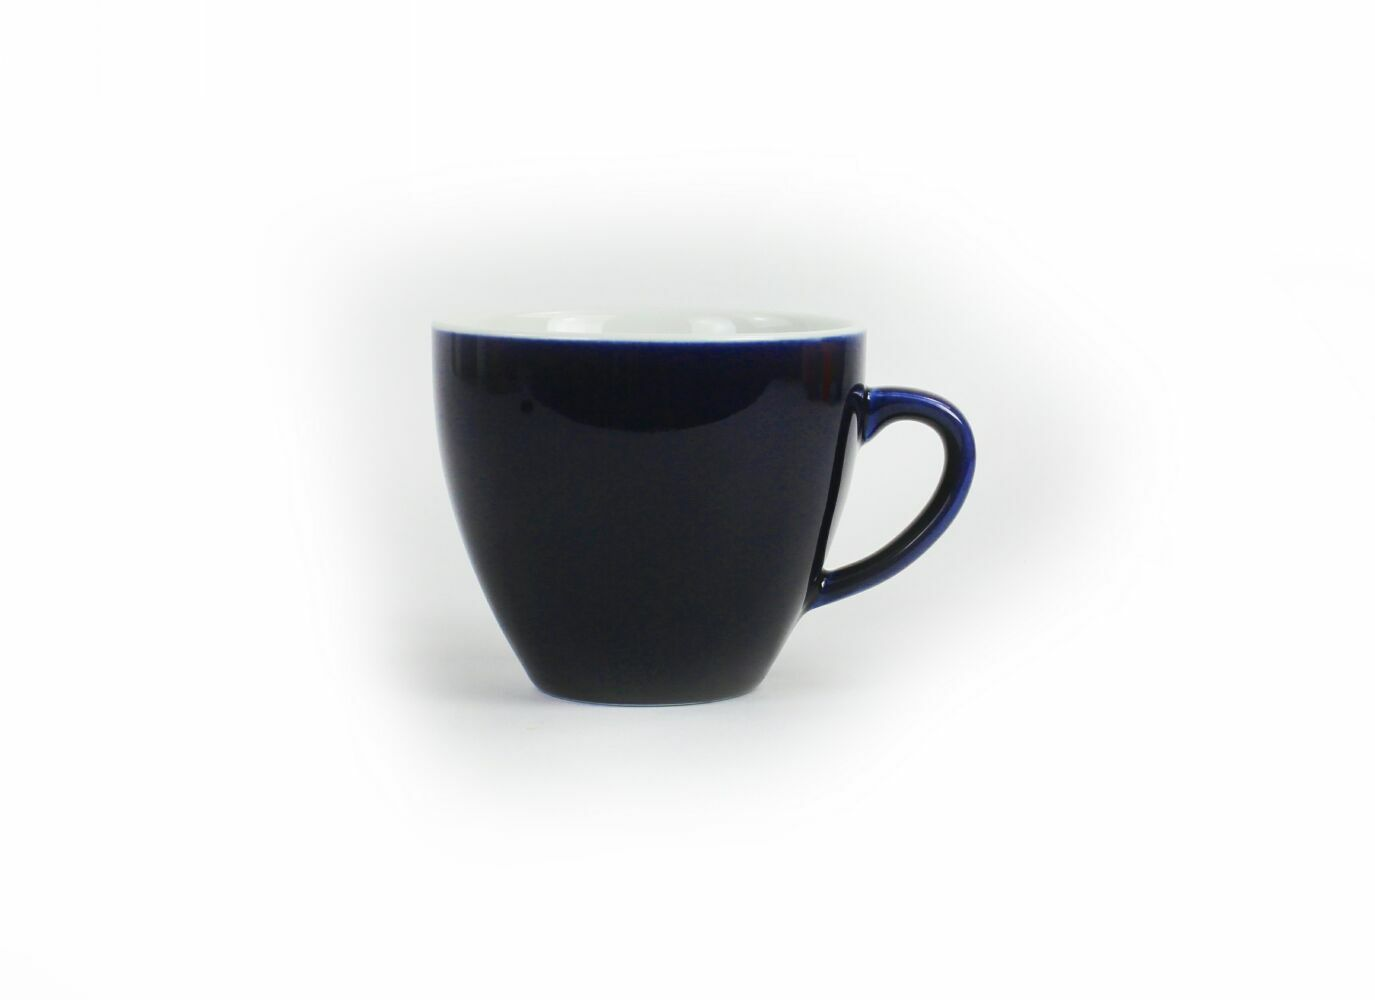 Пинкл (Pinkl) | Кружка с акулой темная 330мл | Creature Cups Shark Deep Blue